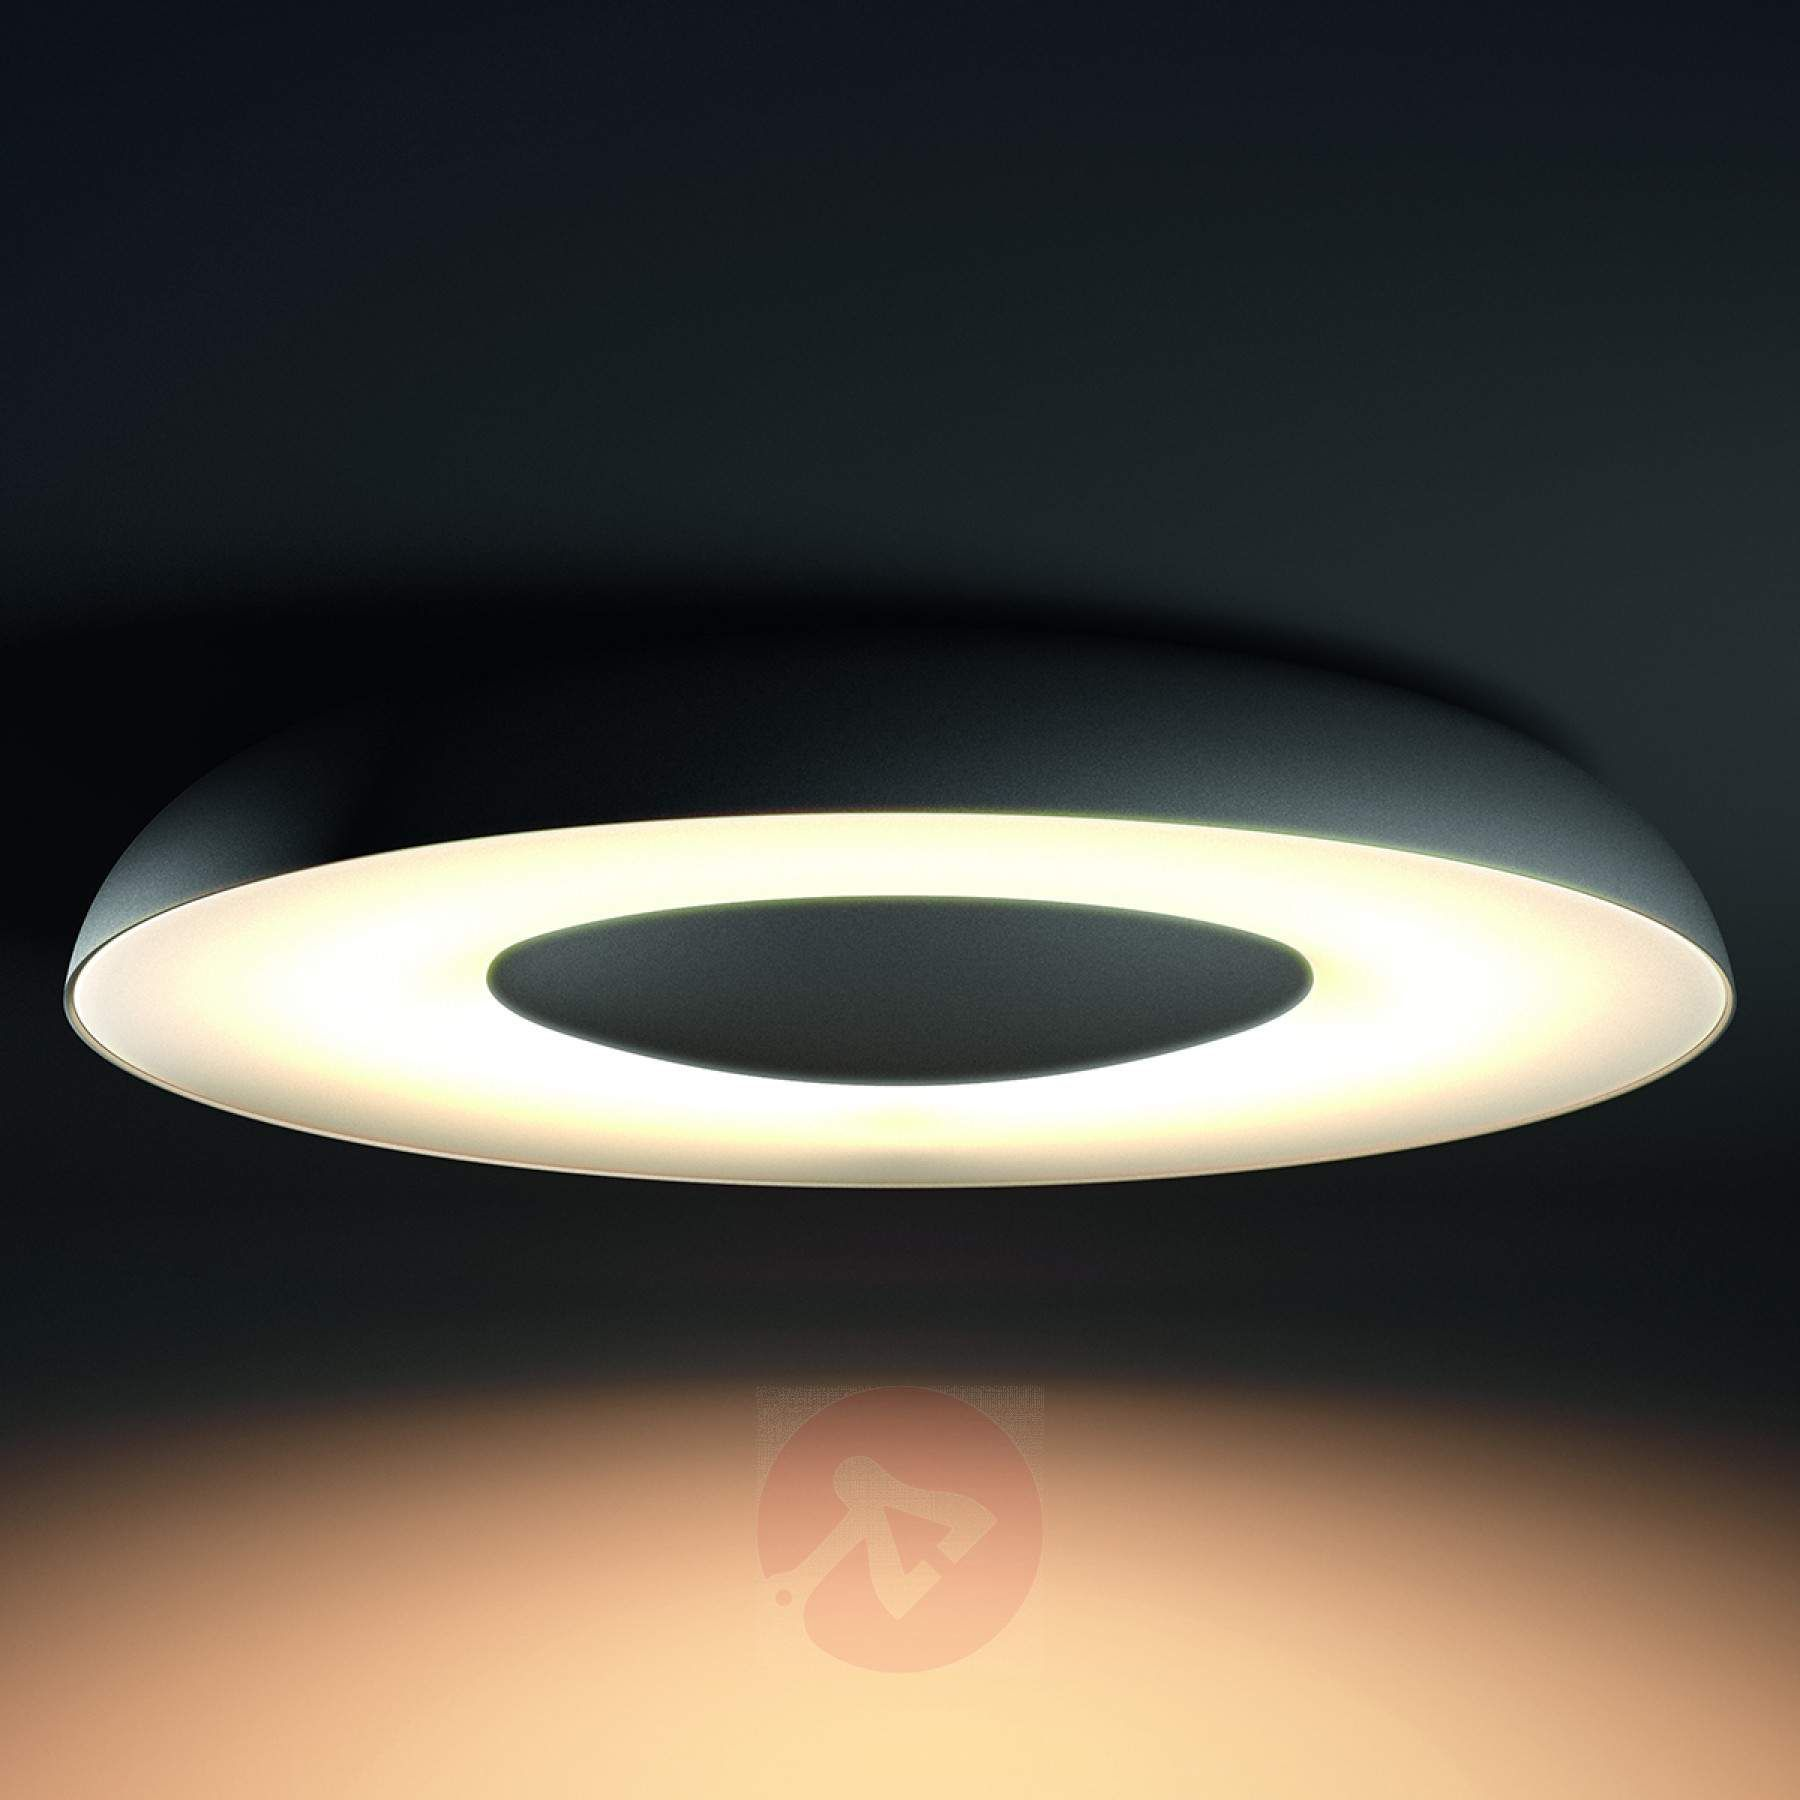 Steuerbare Led Deckenlampe Still Philips Hue 7531868 01 Deckenlampe Led Deckenlampen Lampe